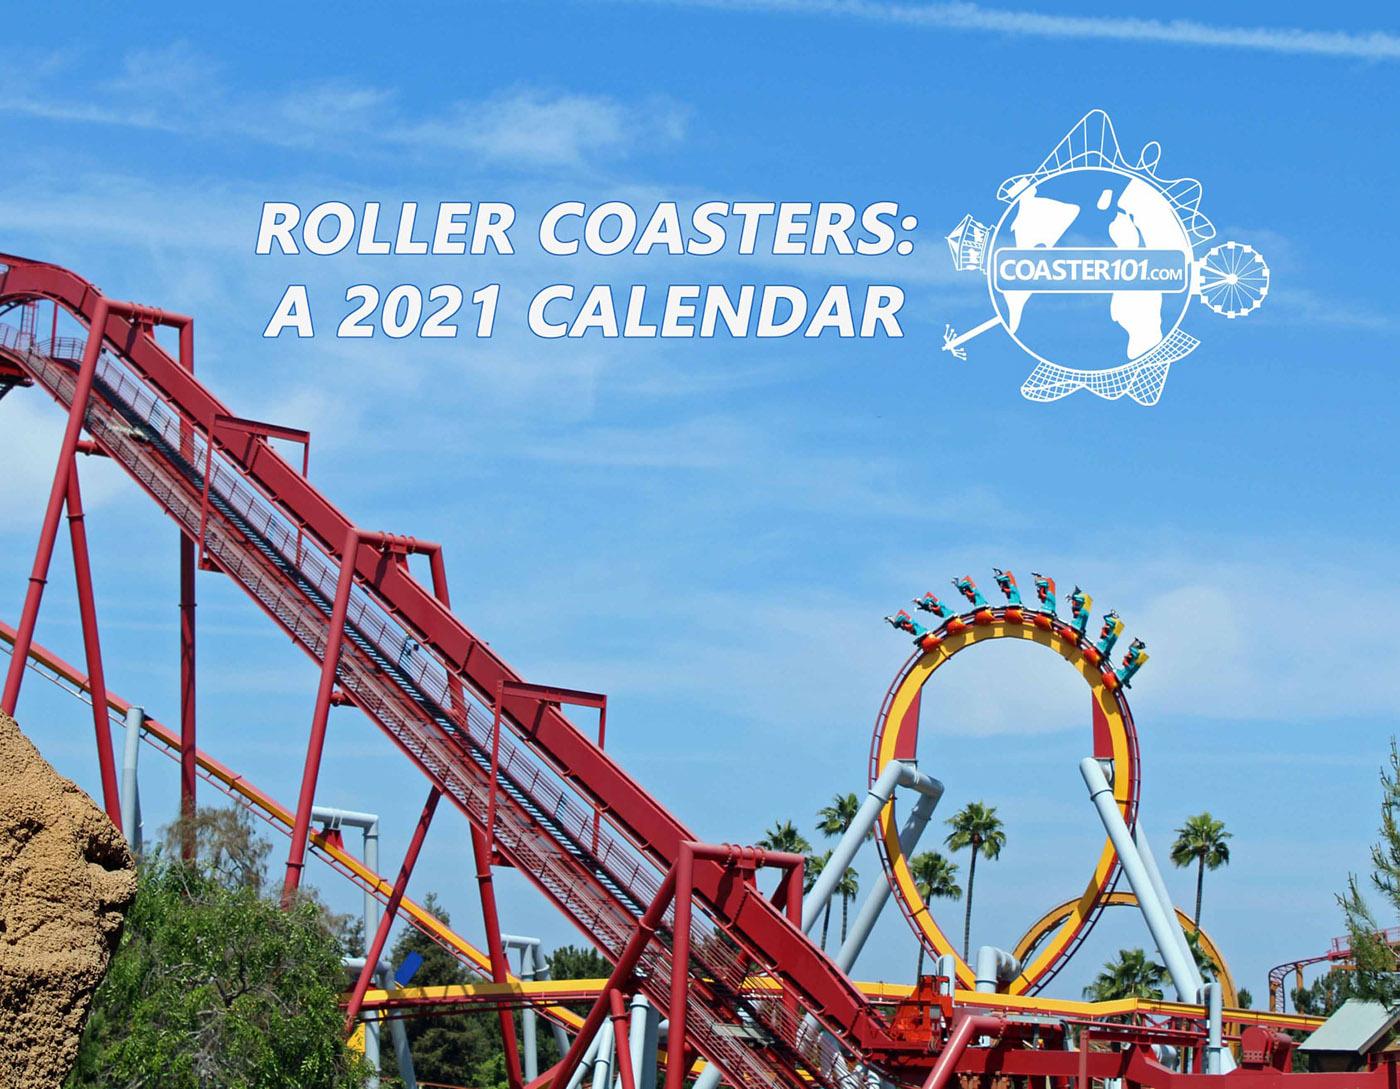 Carowinds Calendar 2022.2021 Coaster101 Calendar Now On Sale 100 Of Proceeds Benefitting Give Kids The World Coaster101